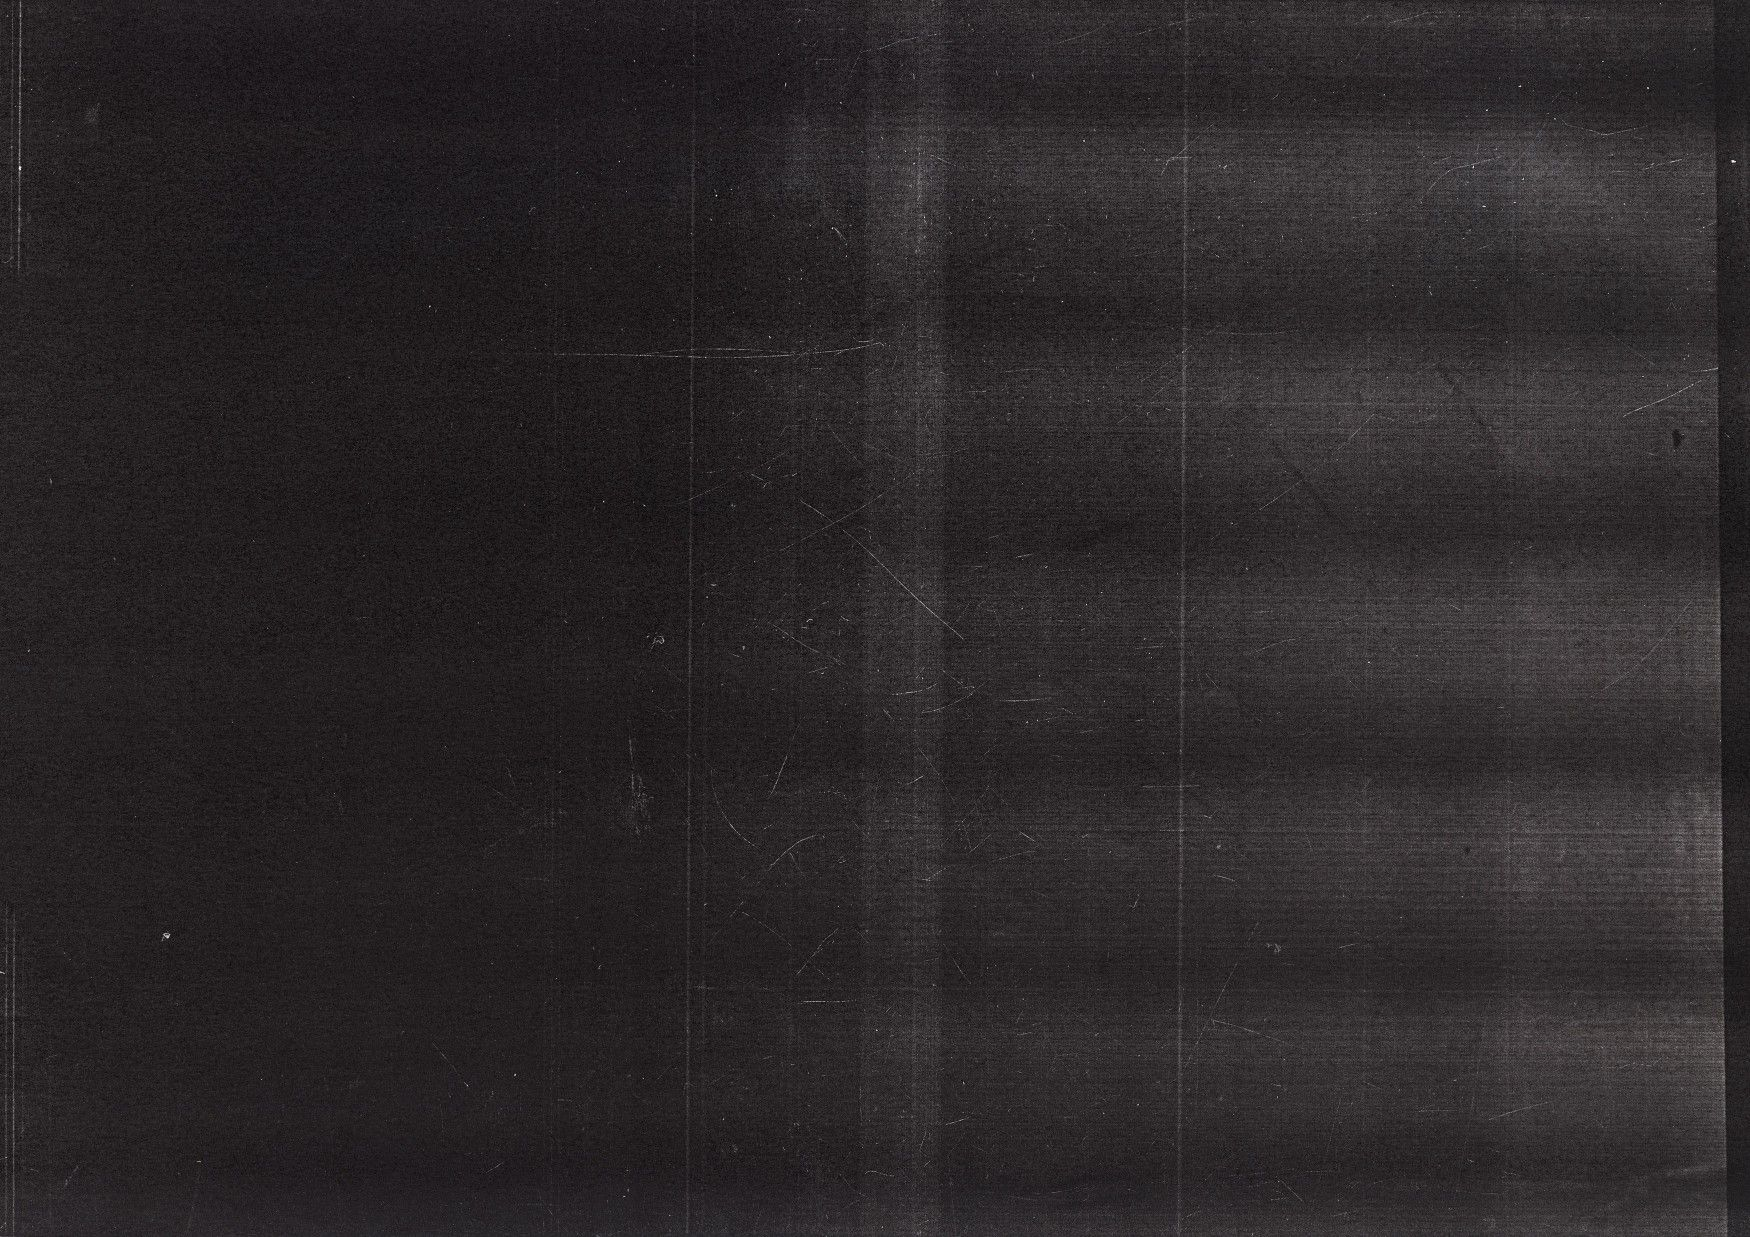 Texturefabrik Com Photocopy Xerox Texture Grit Raster